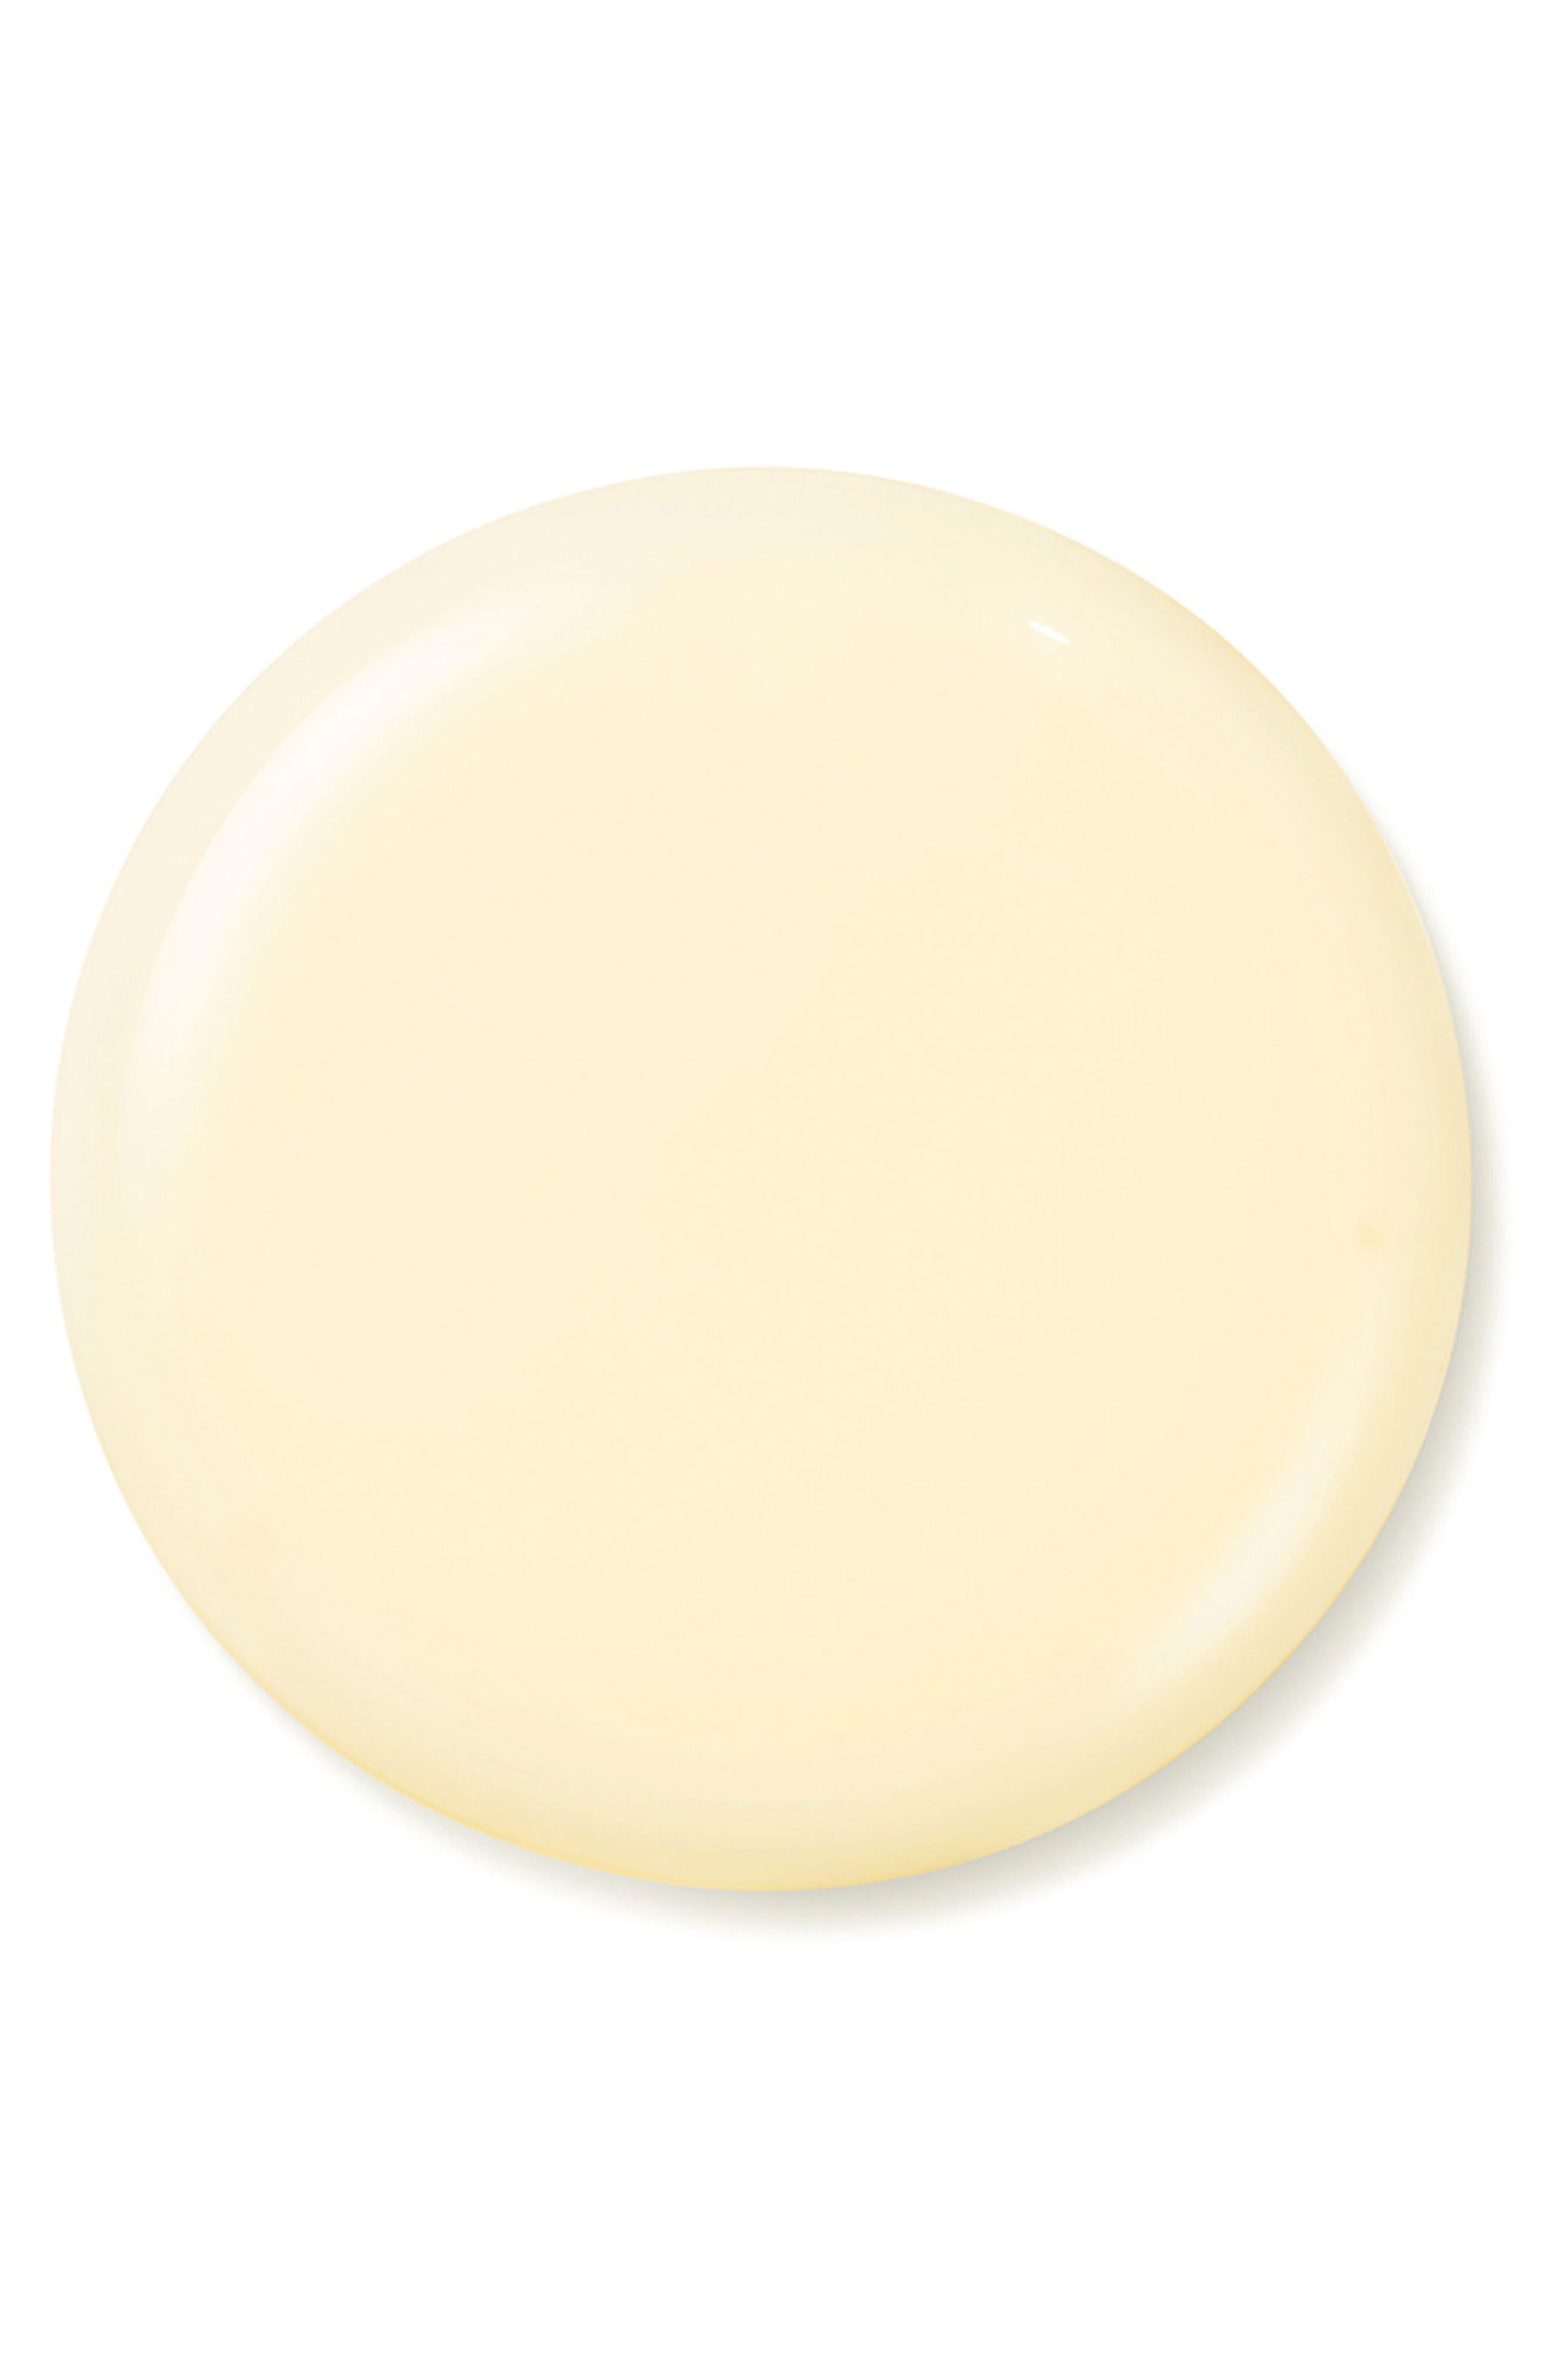 'Benefiance WrinkleResist24' Day Emulsion SPF 18,                             Alternate thumbnail 4, color,                             NO COLOR